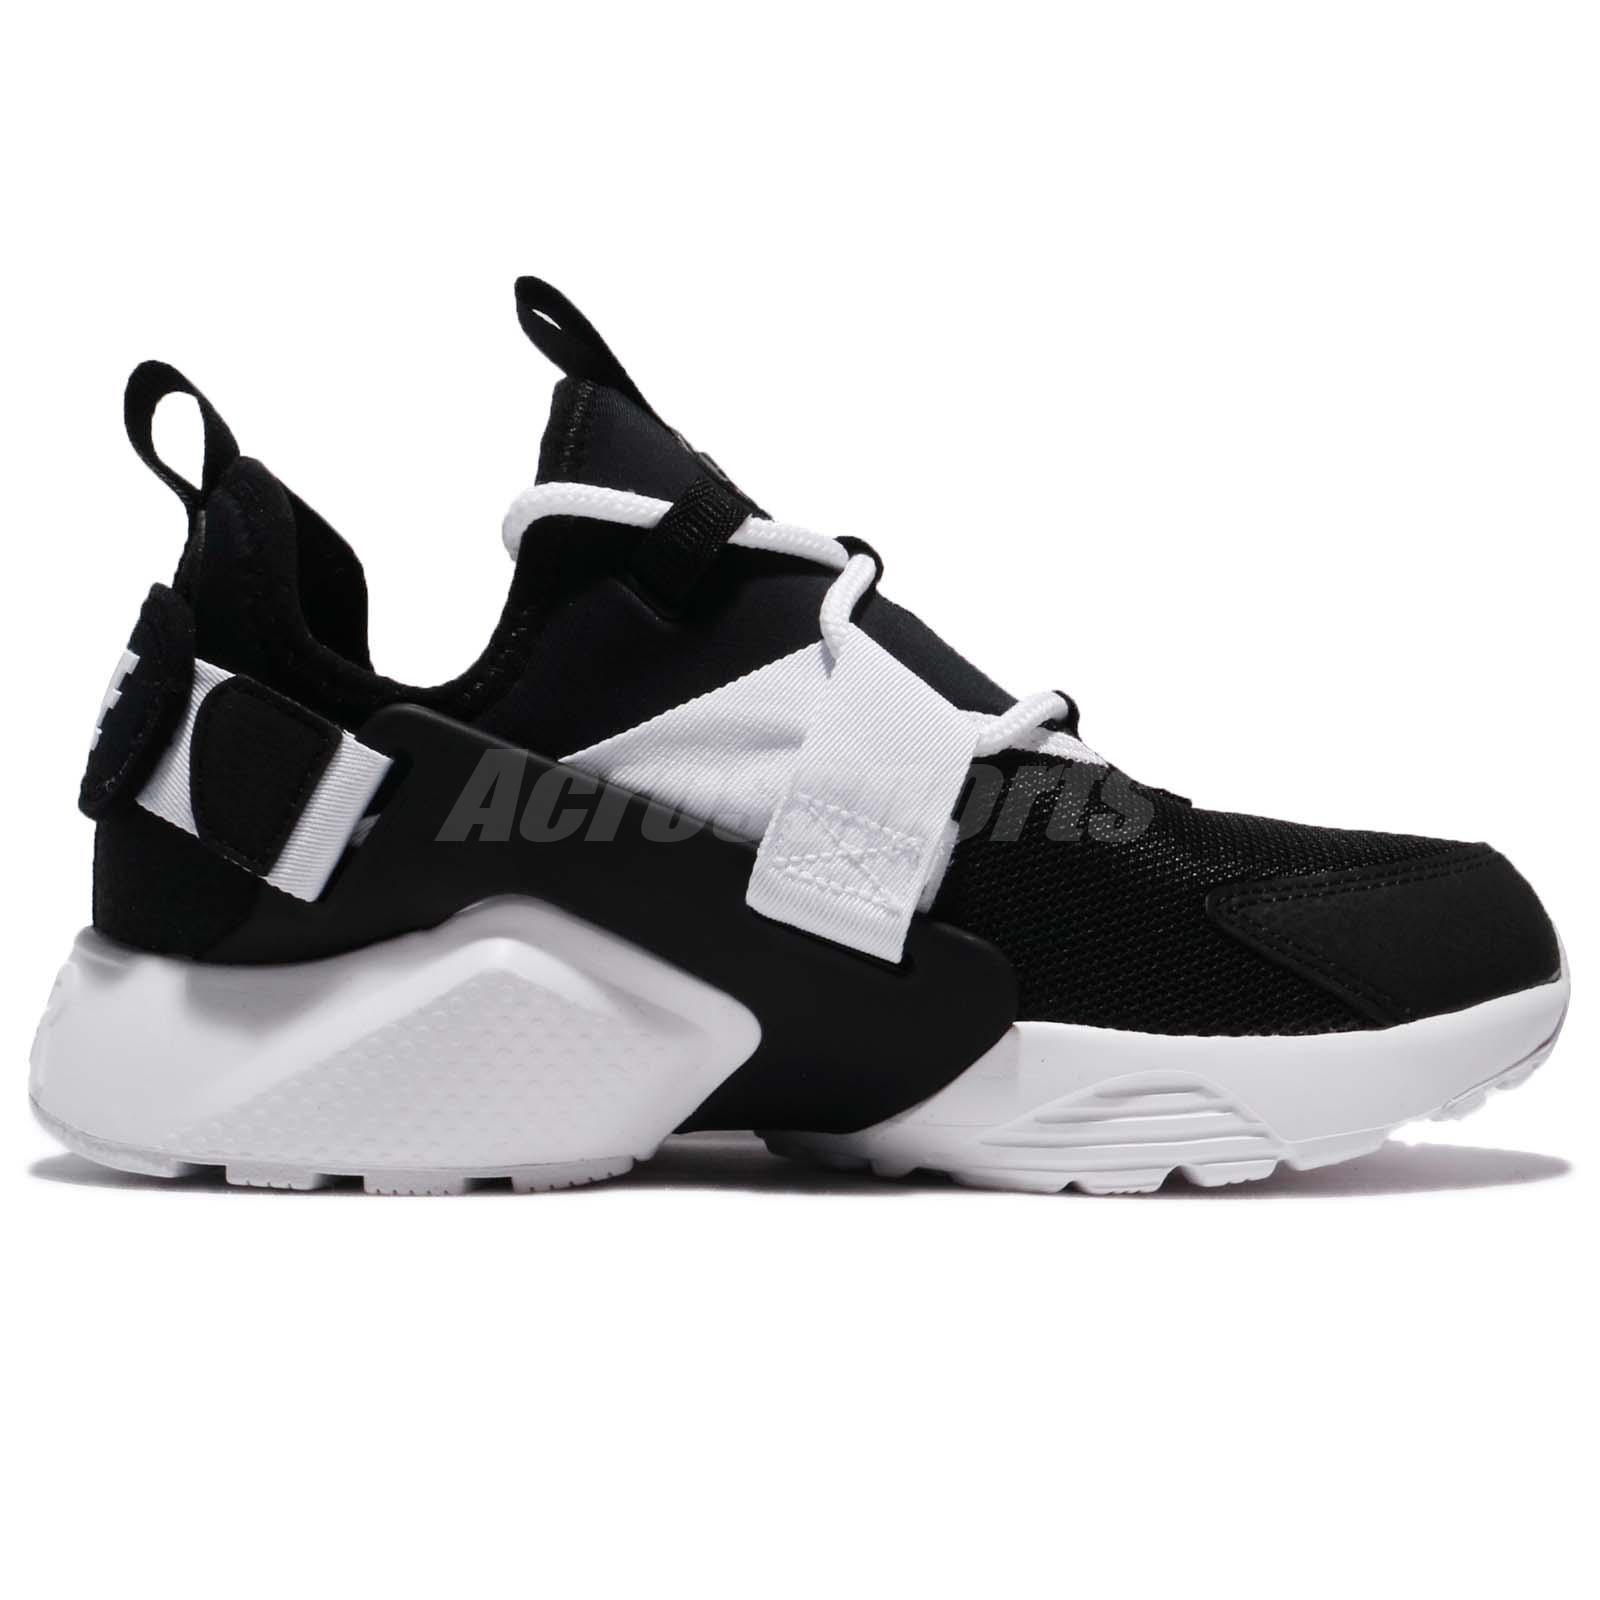 6652acbcef1e Nike Wmns Air Huarache City Low Black White Women Running Shoes ...